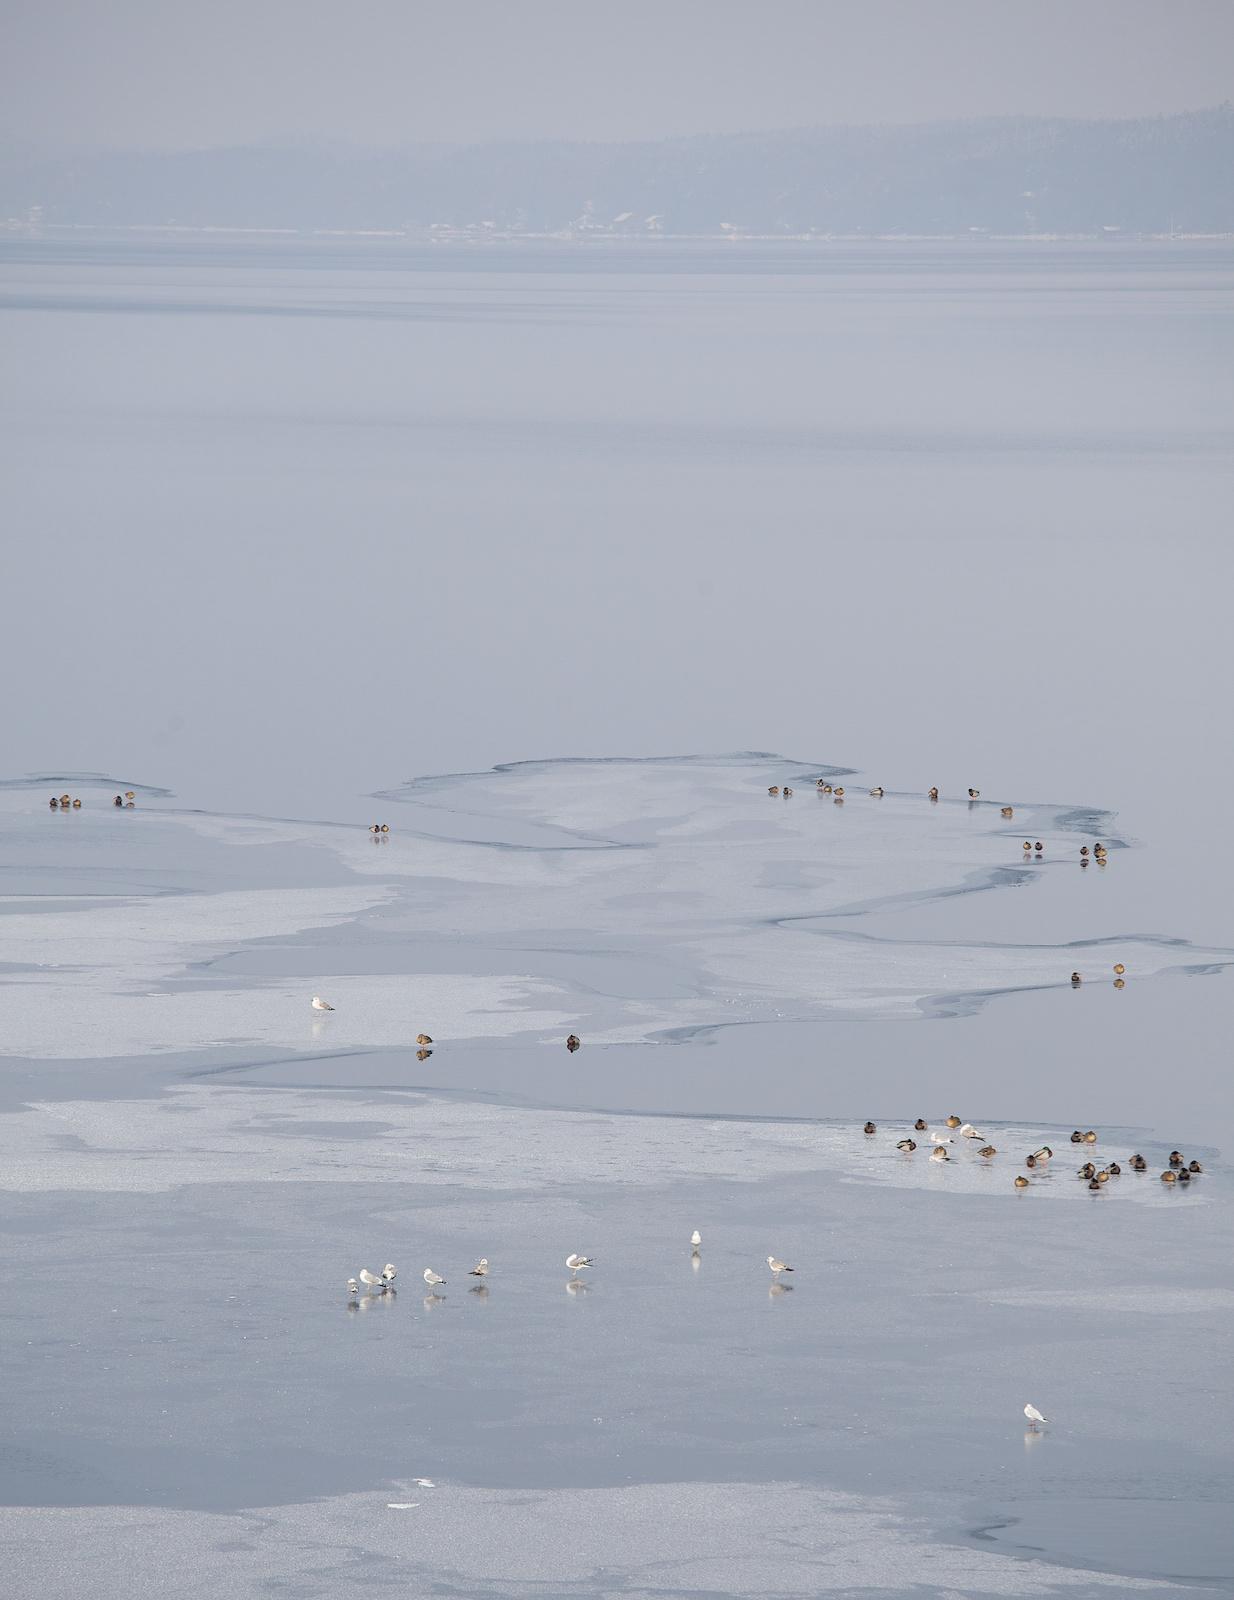 Wasservögel Eis Seeshaupt 31.02 - Arbeitskopie 2.jpg